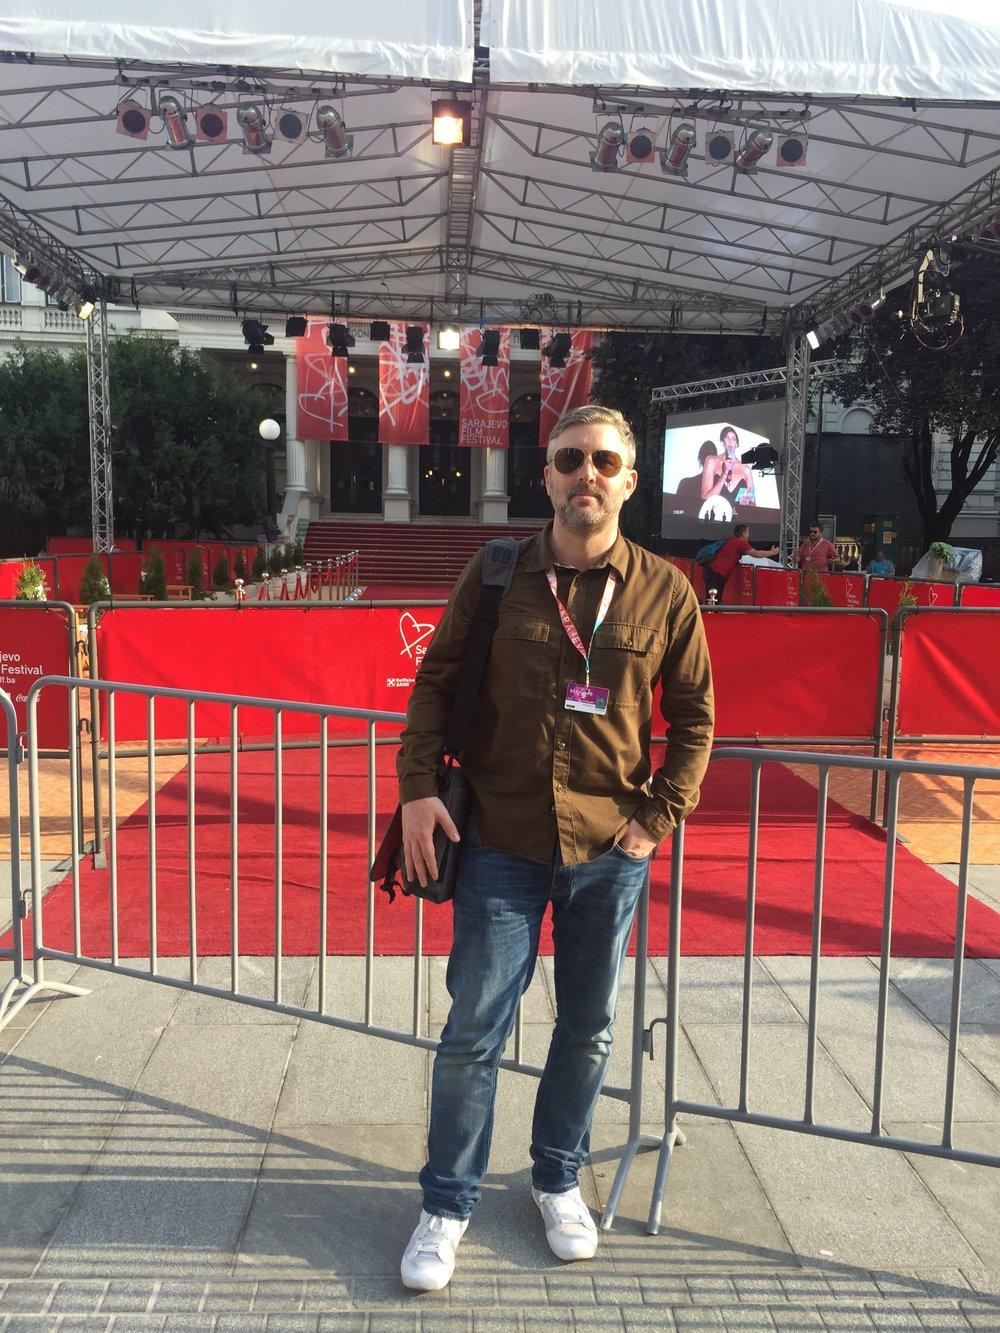 Director/producer M J McMahon